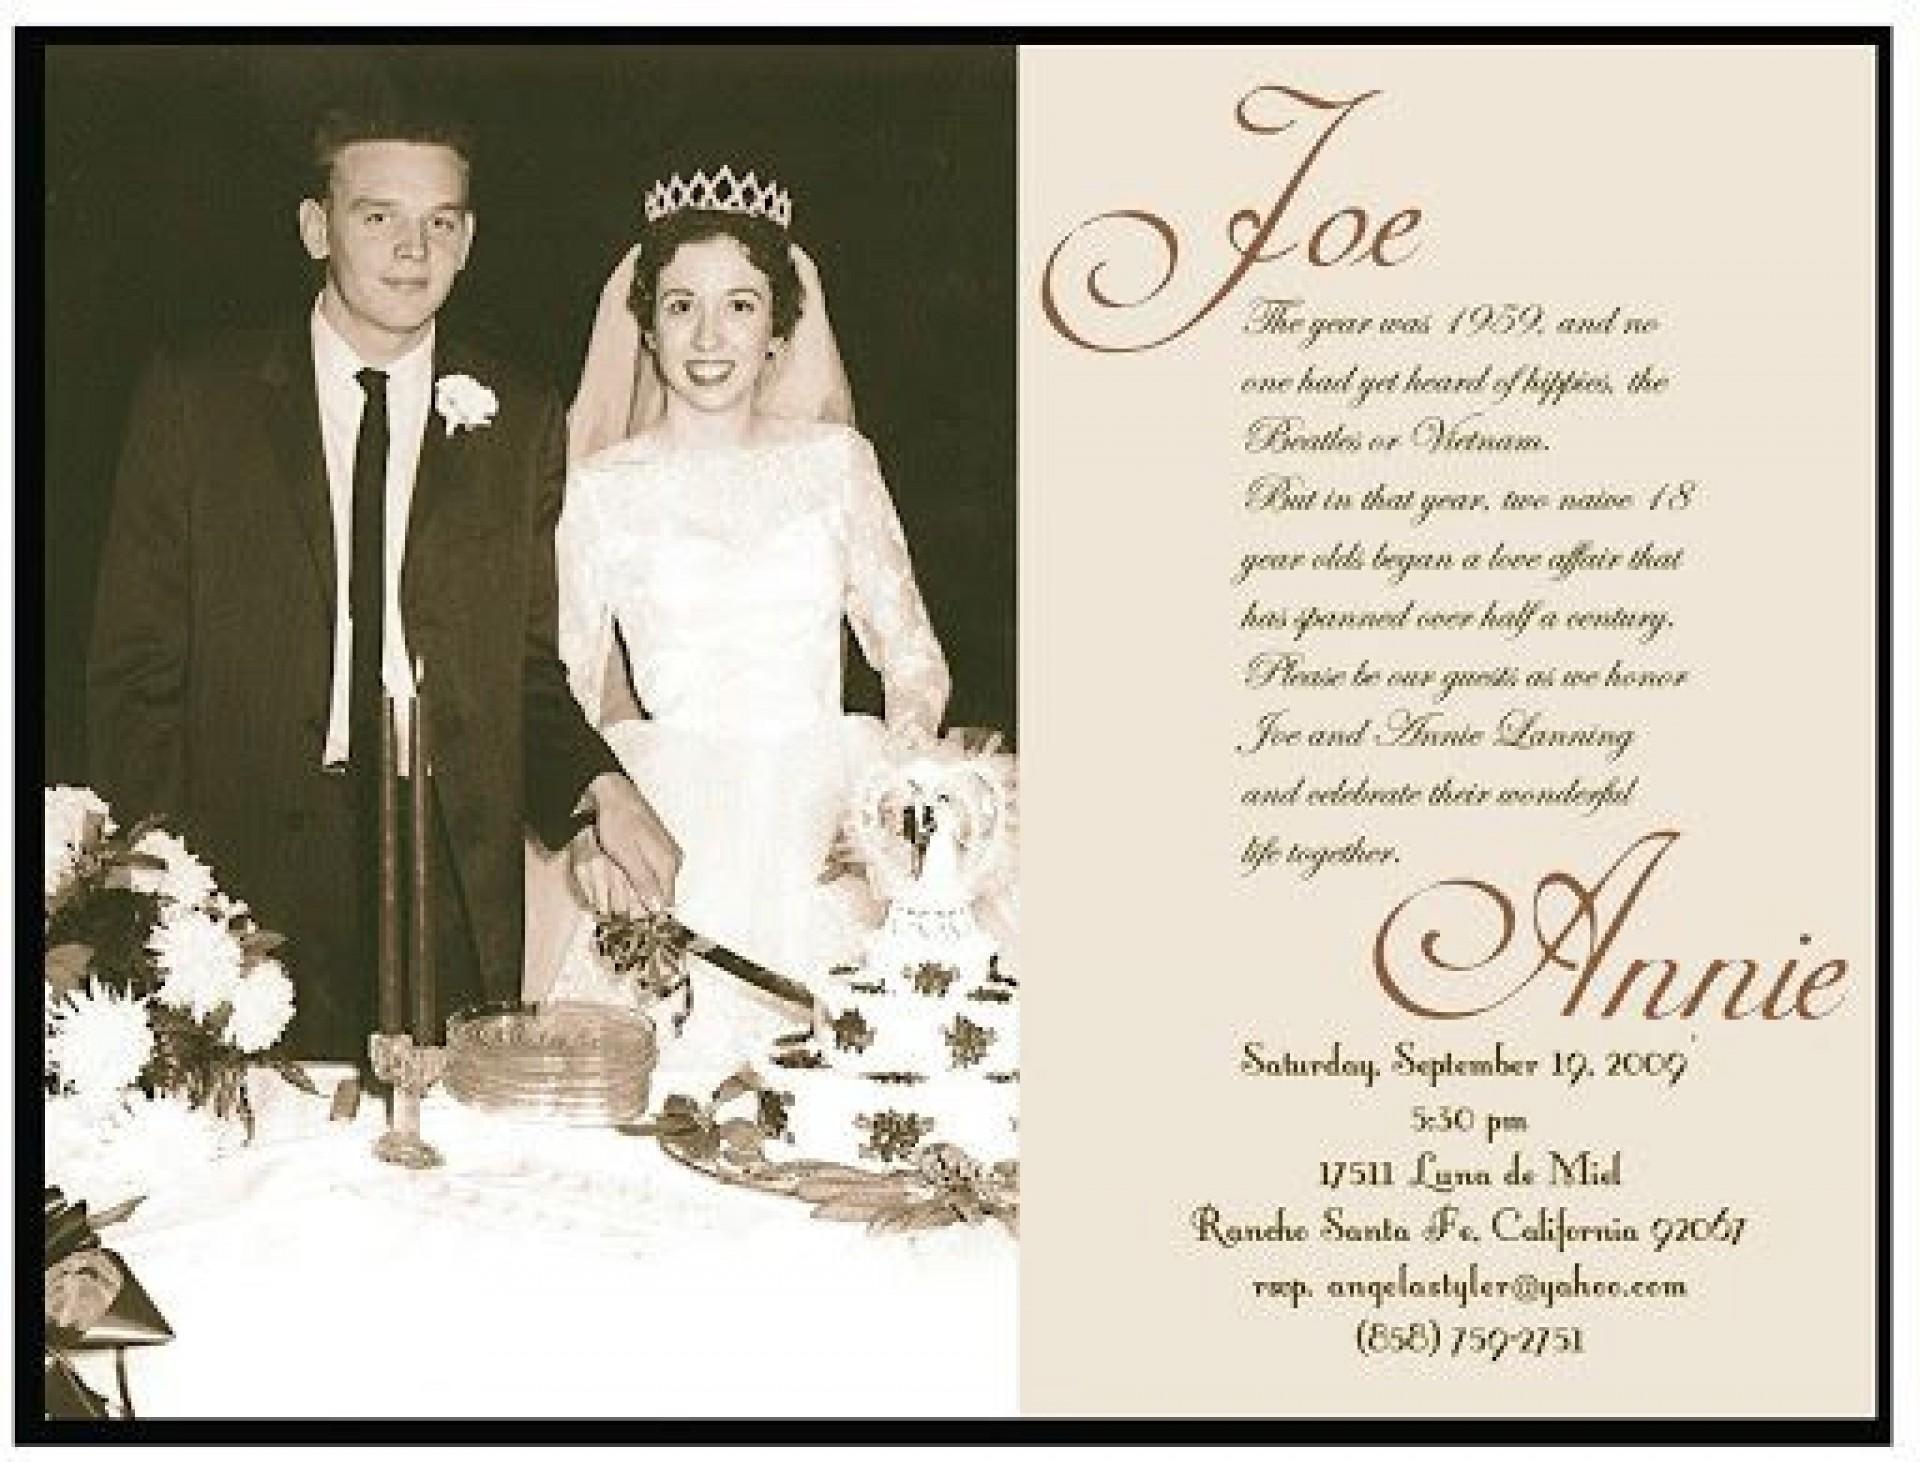 004 Awesome 50th Wedding Anniversary Invitation Template Microsoft Word Image  Free1920